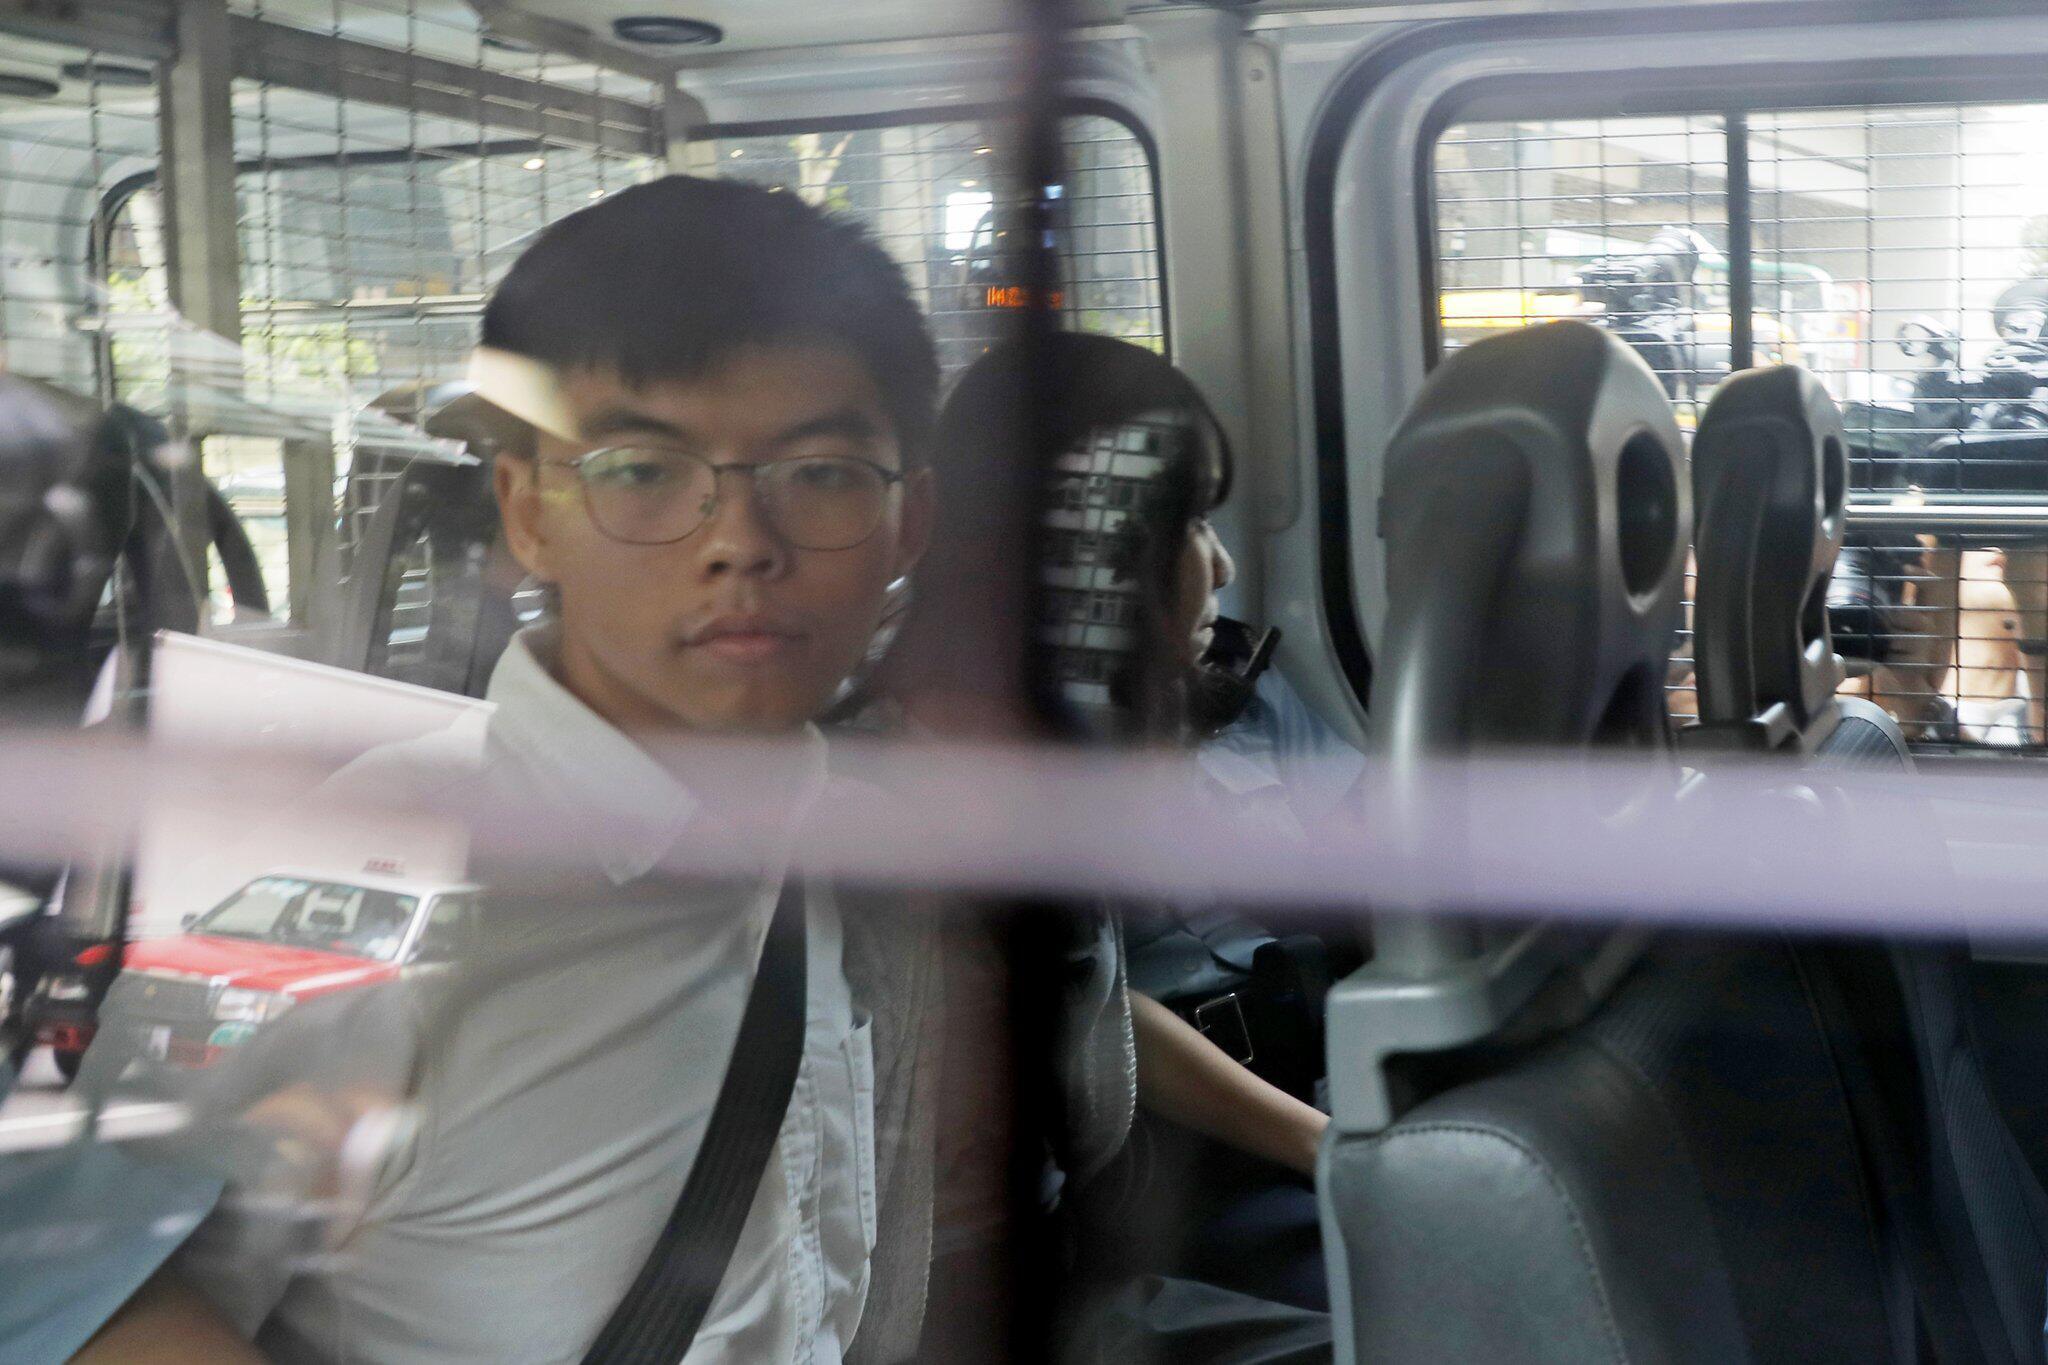 Bild zu Proteste in Hongkong - Festnahmen